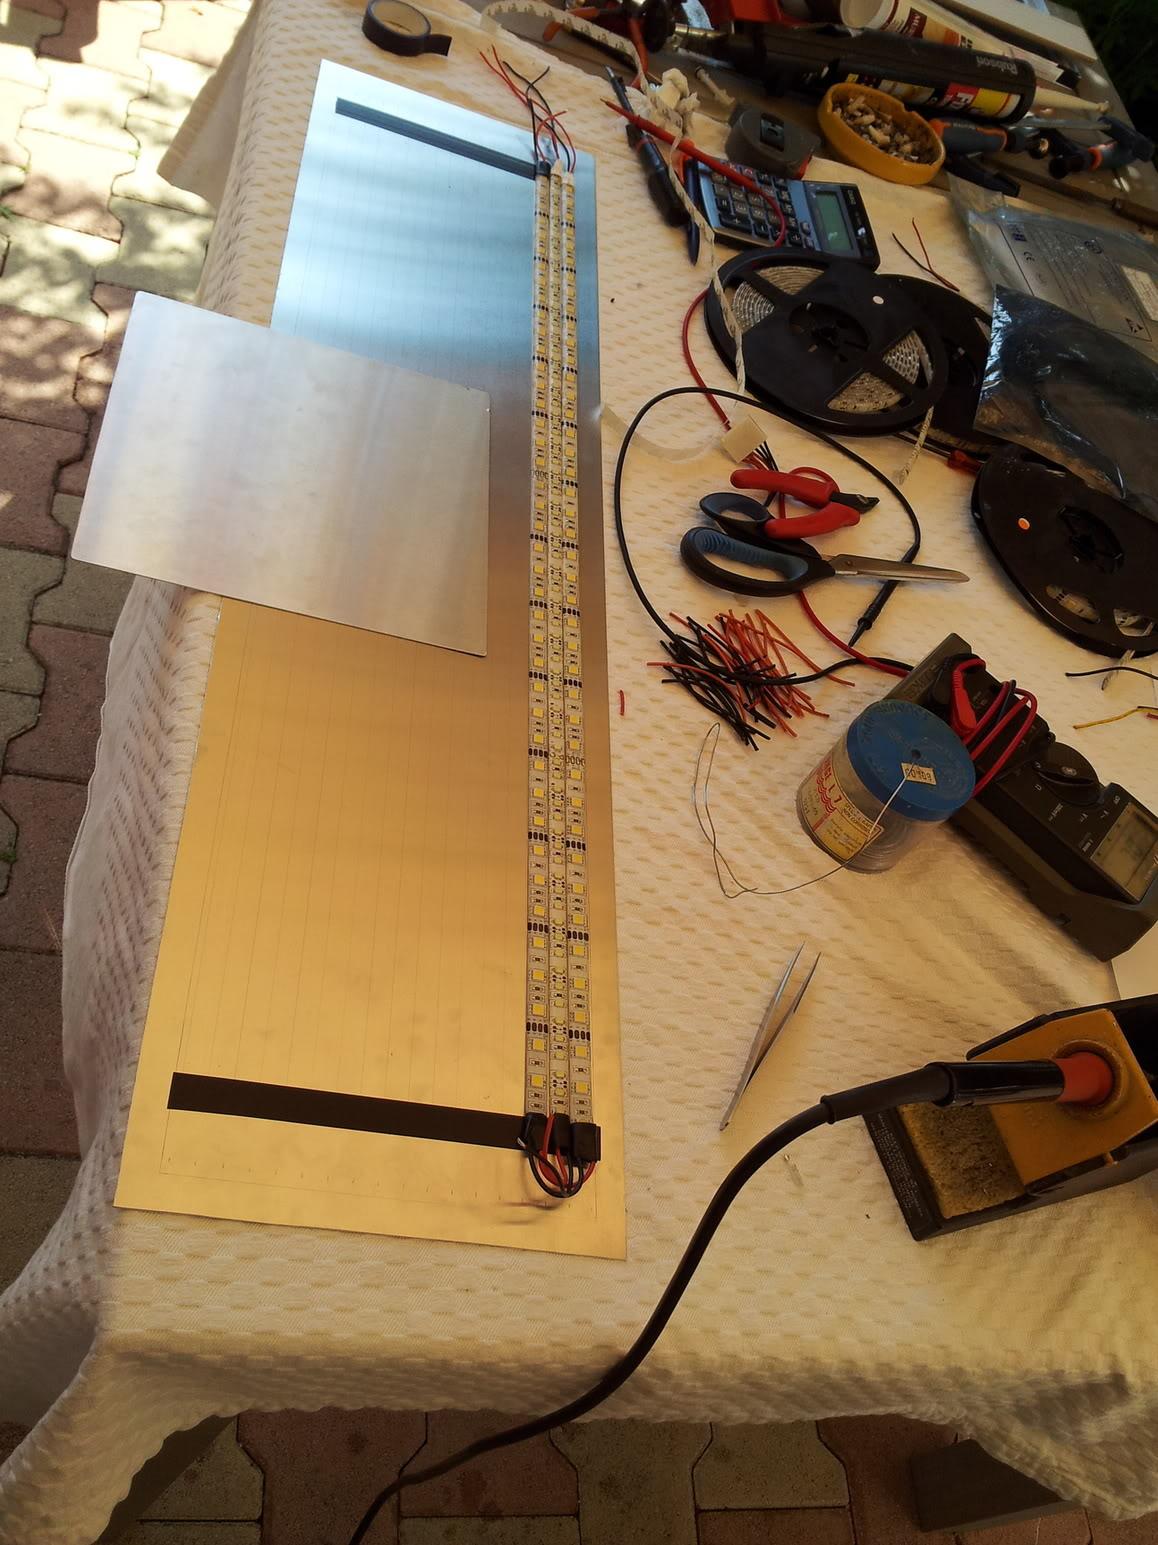 Fabrication galerie LED pour Juwel rio 125 (80cmx20cmx1.8cm) 20120713_161750